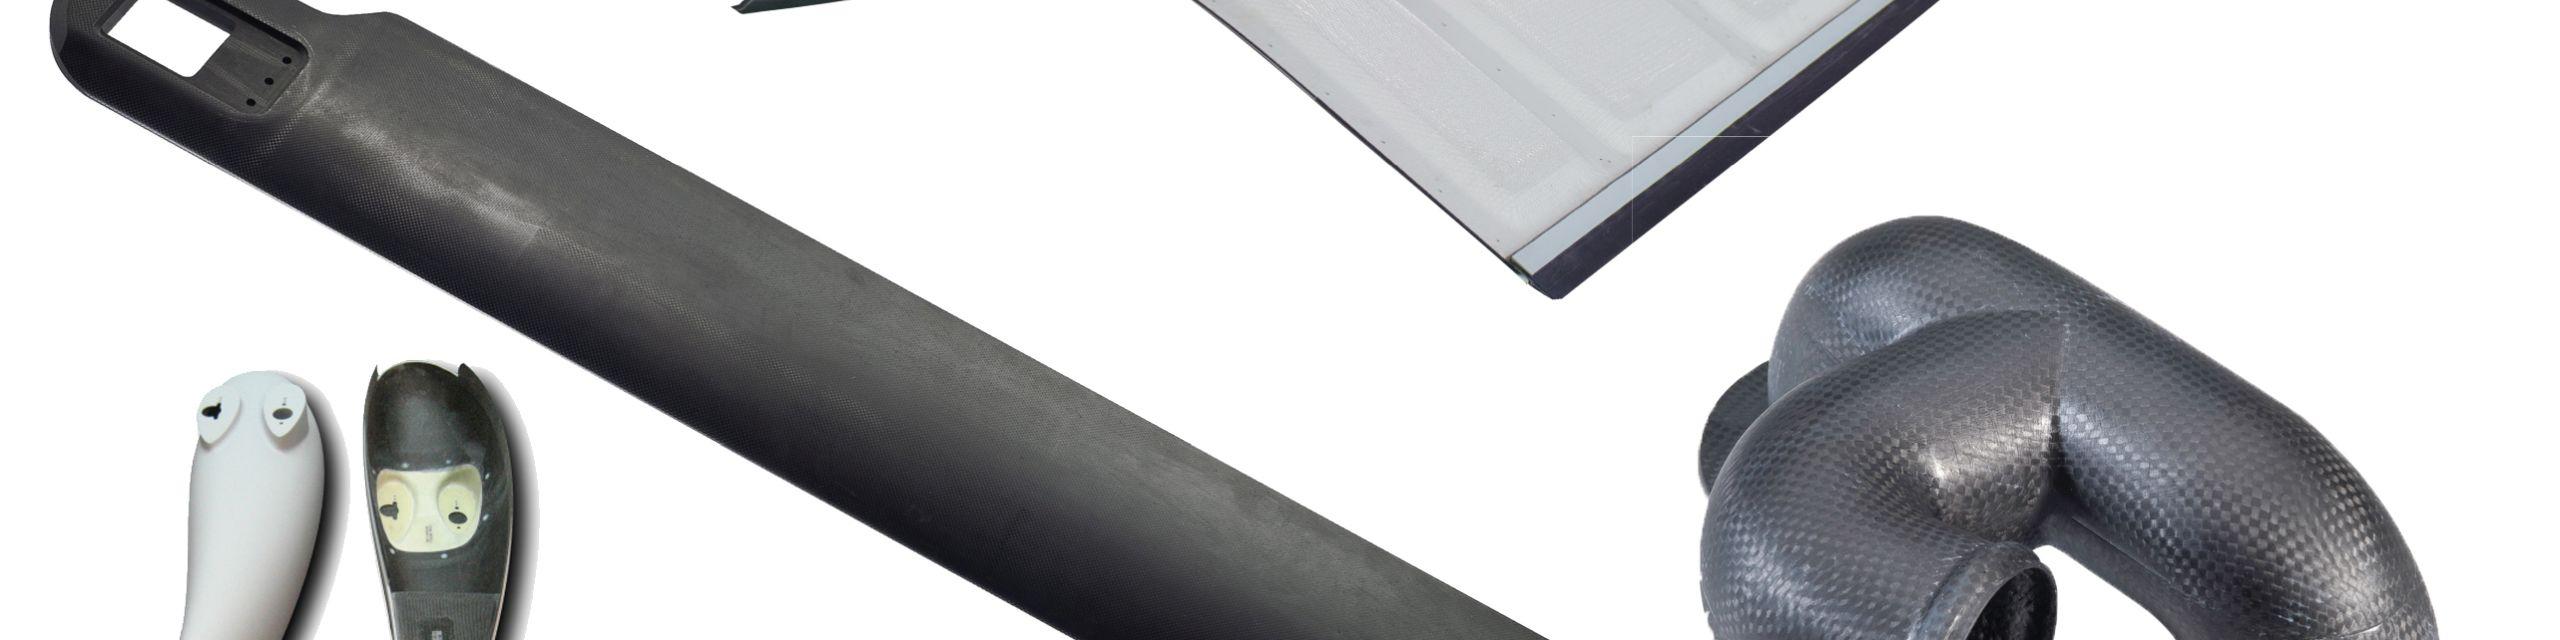 Kanfit Ltd. aerospace composites manufacturer